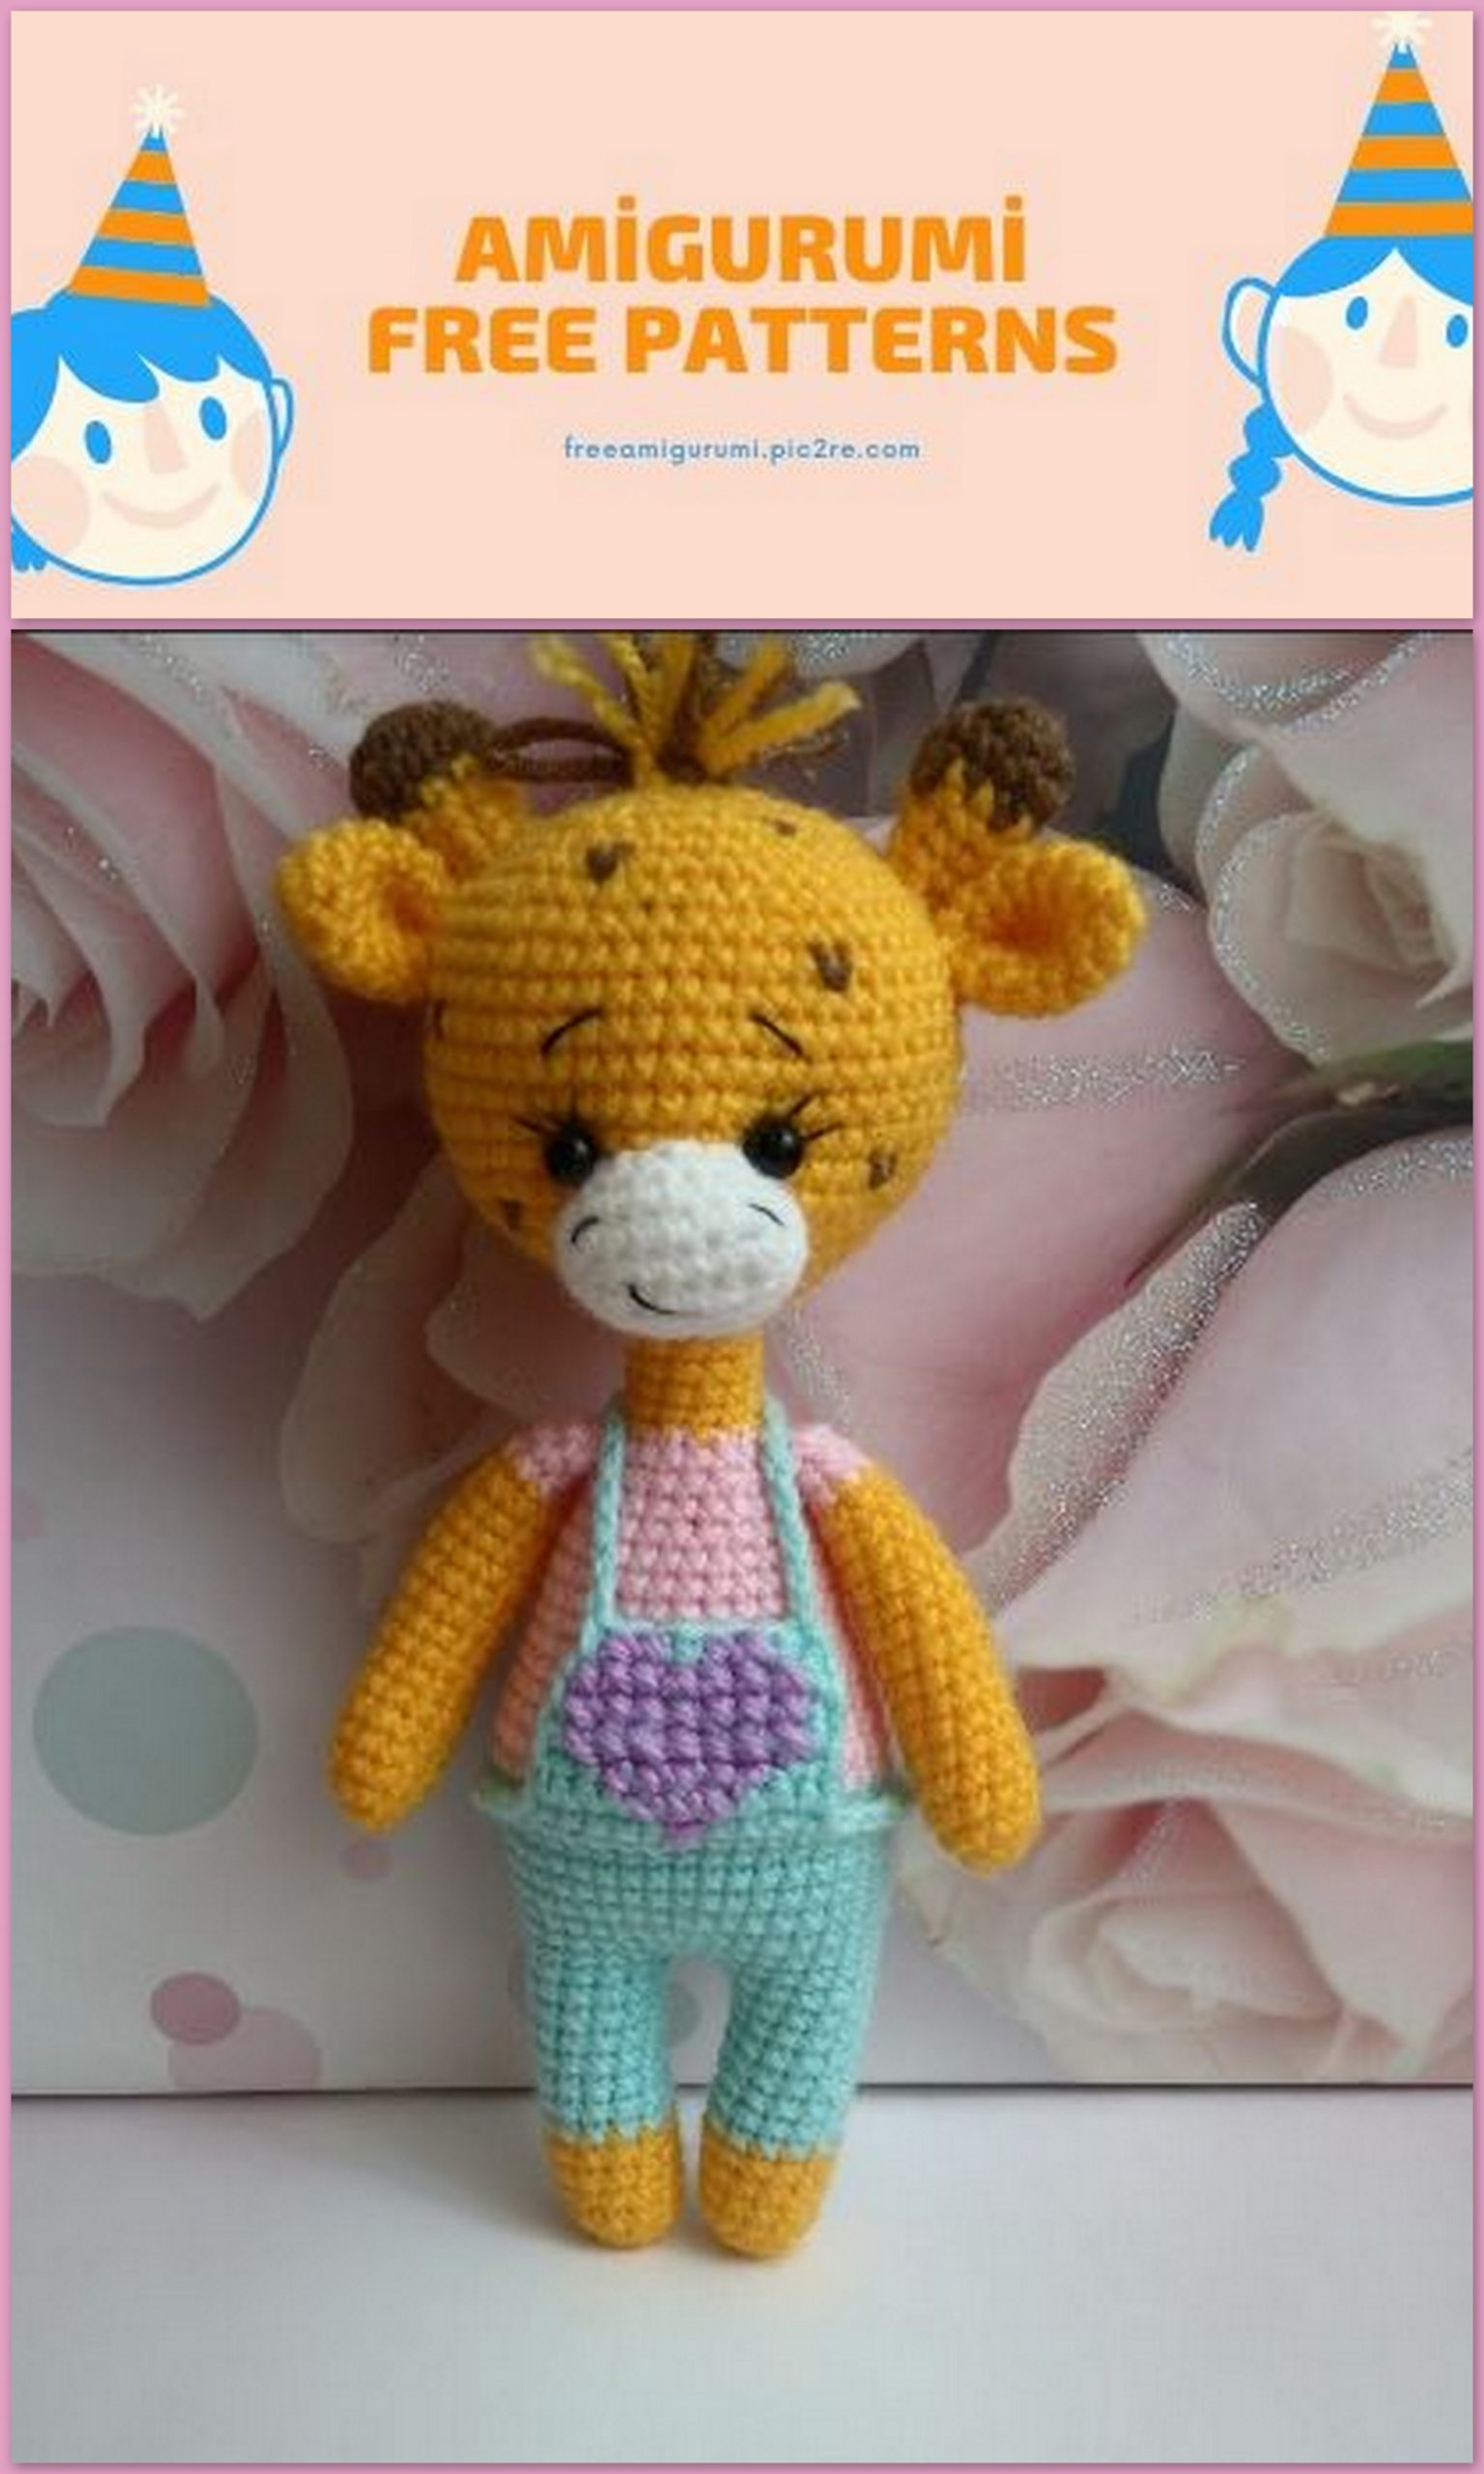 Sleeping Giraffe Amigurumi free crochet pattern - Amigu World | 2560x1536